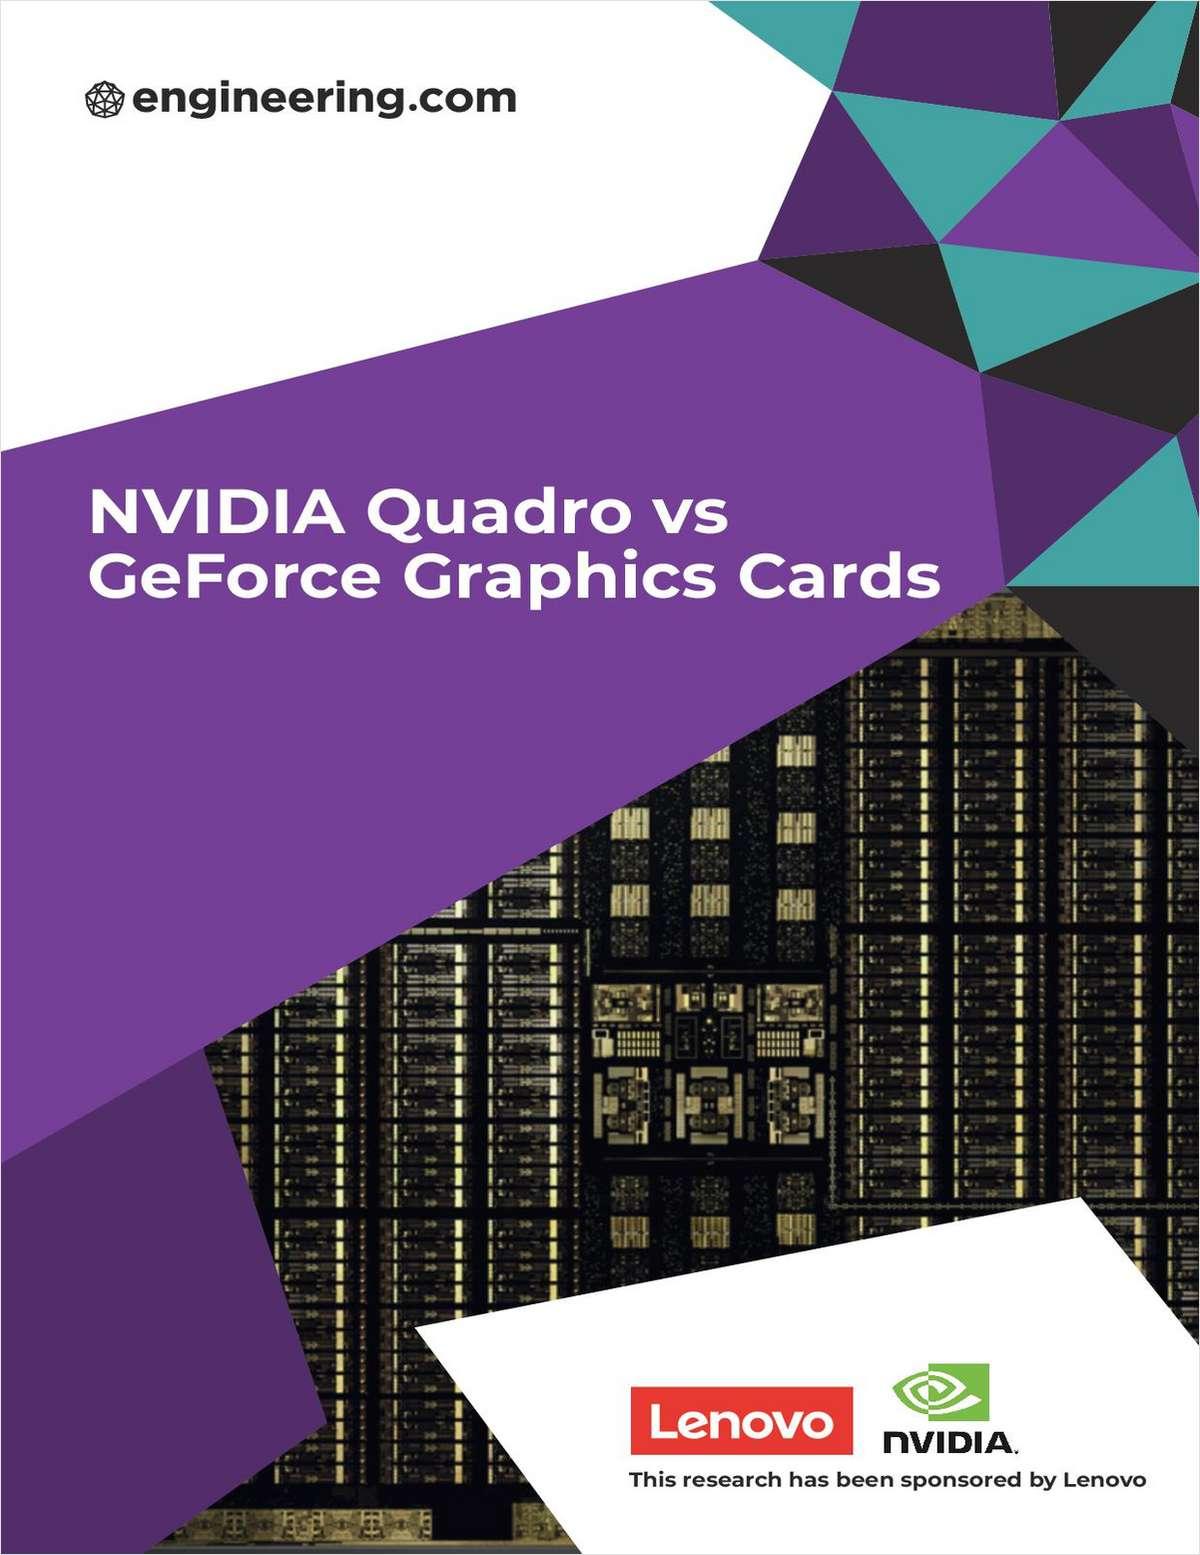 NVIDIA Quadro vs GeForce Graphics Cards